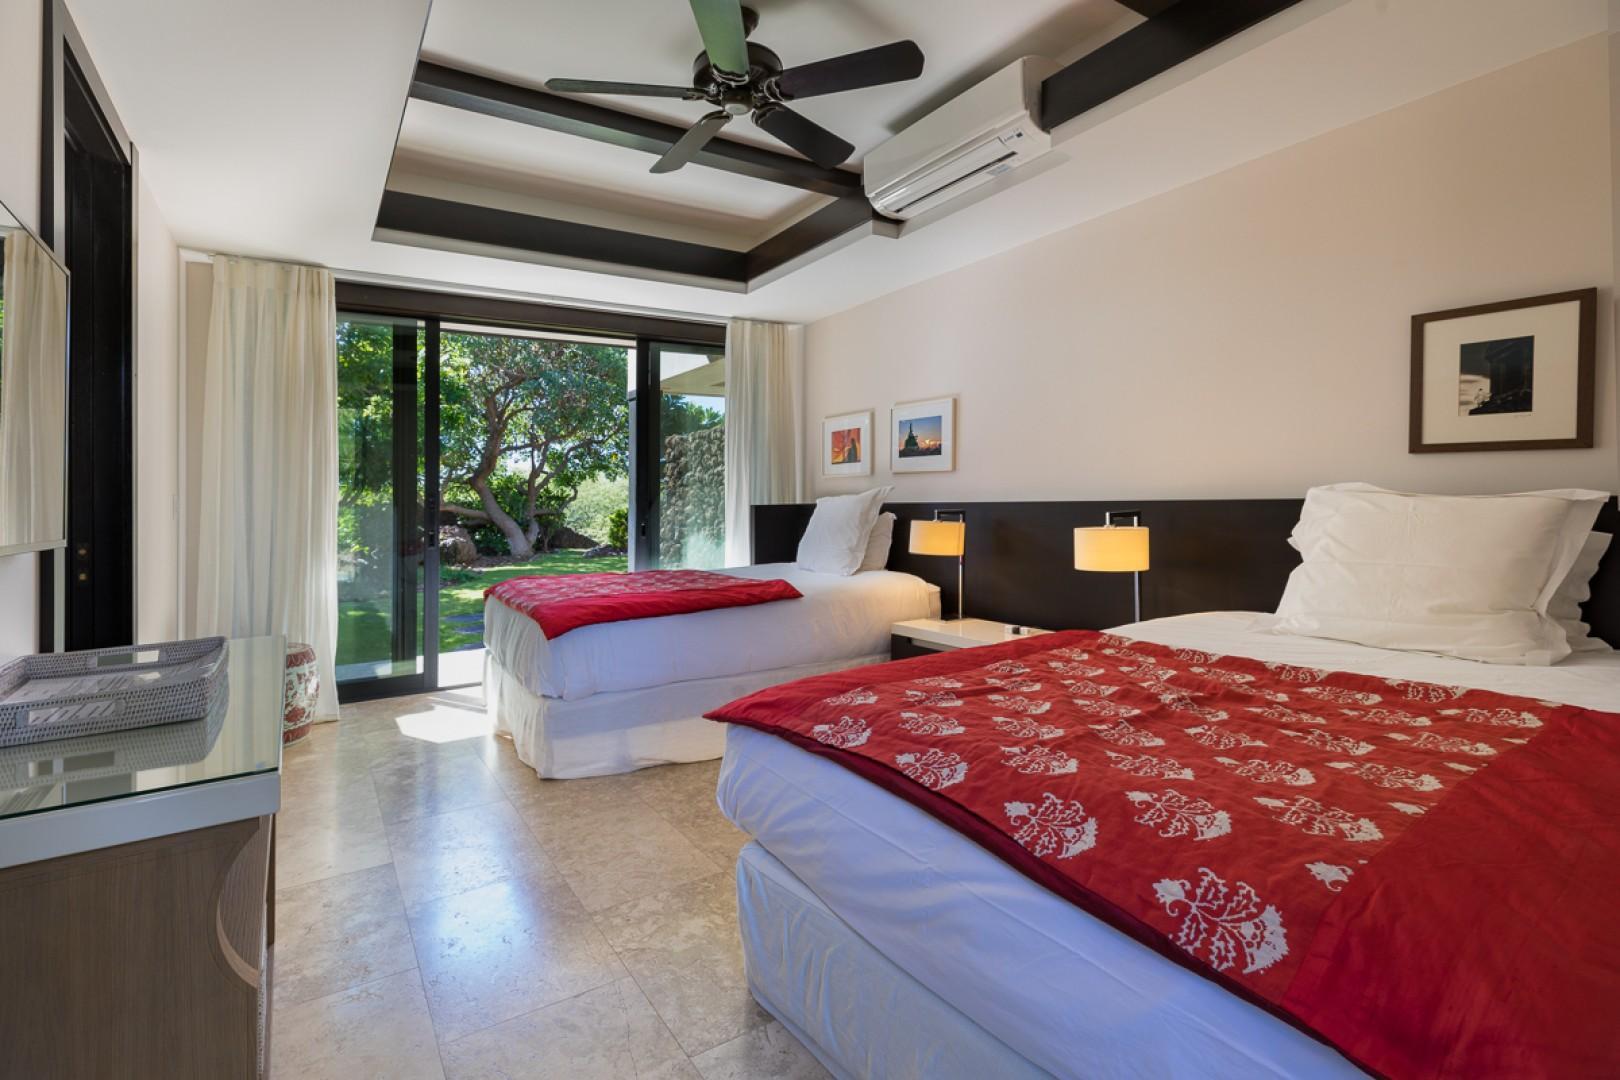 One of the five bedroom suites